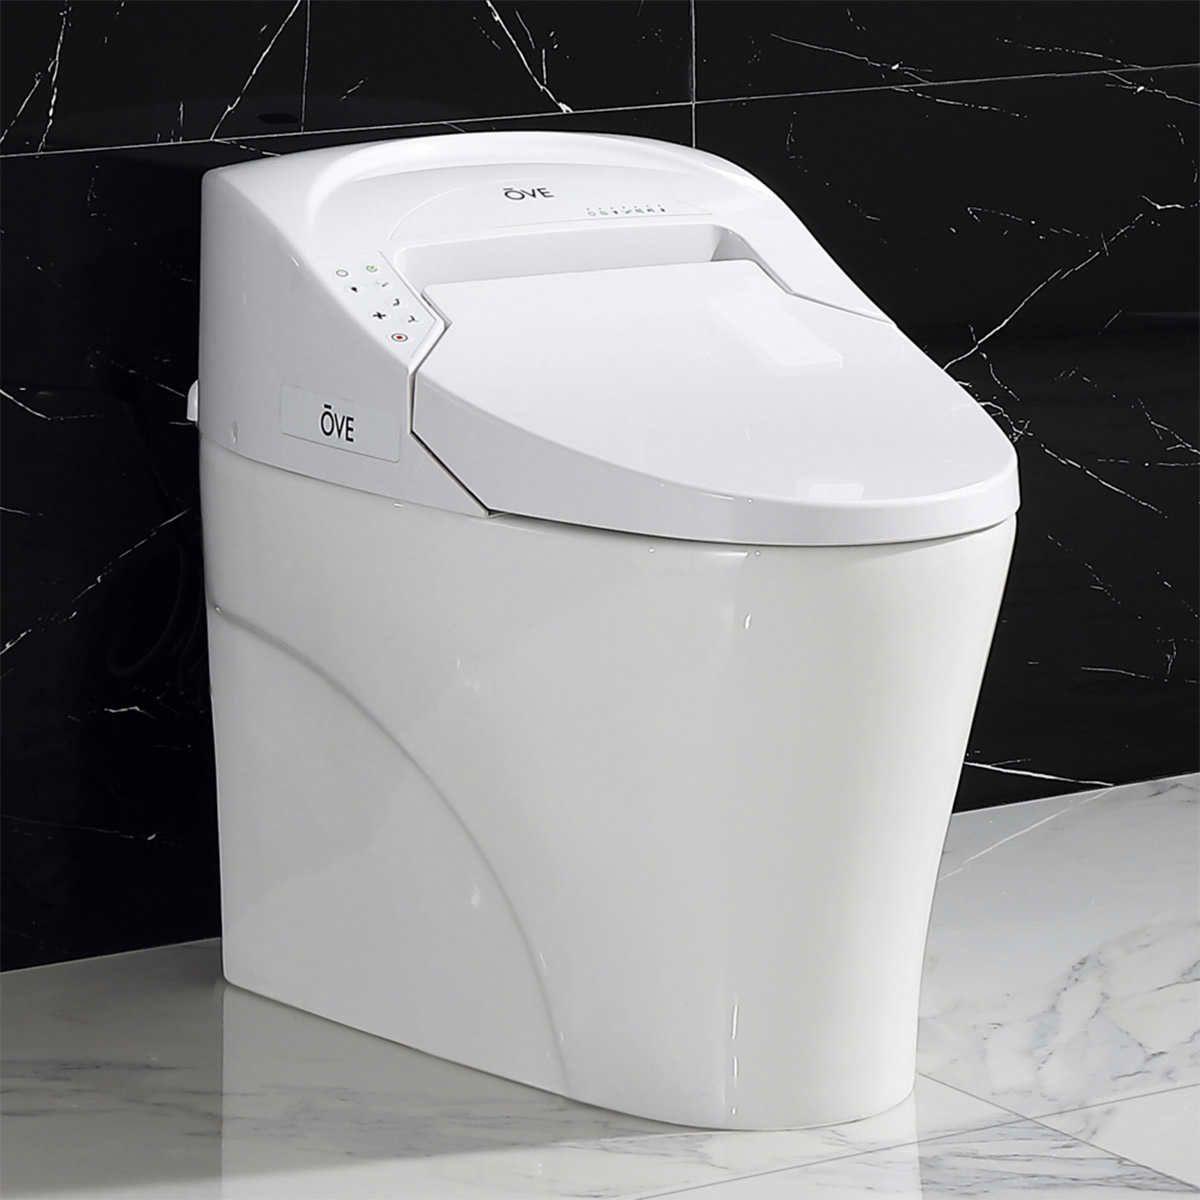 Saga Smart Toilet By Ove Decors In 2020 Smart Toilet Toilet